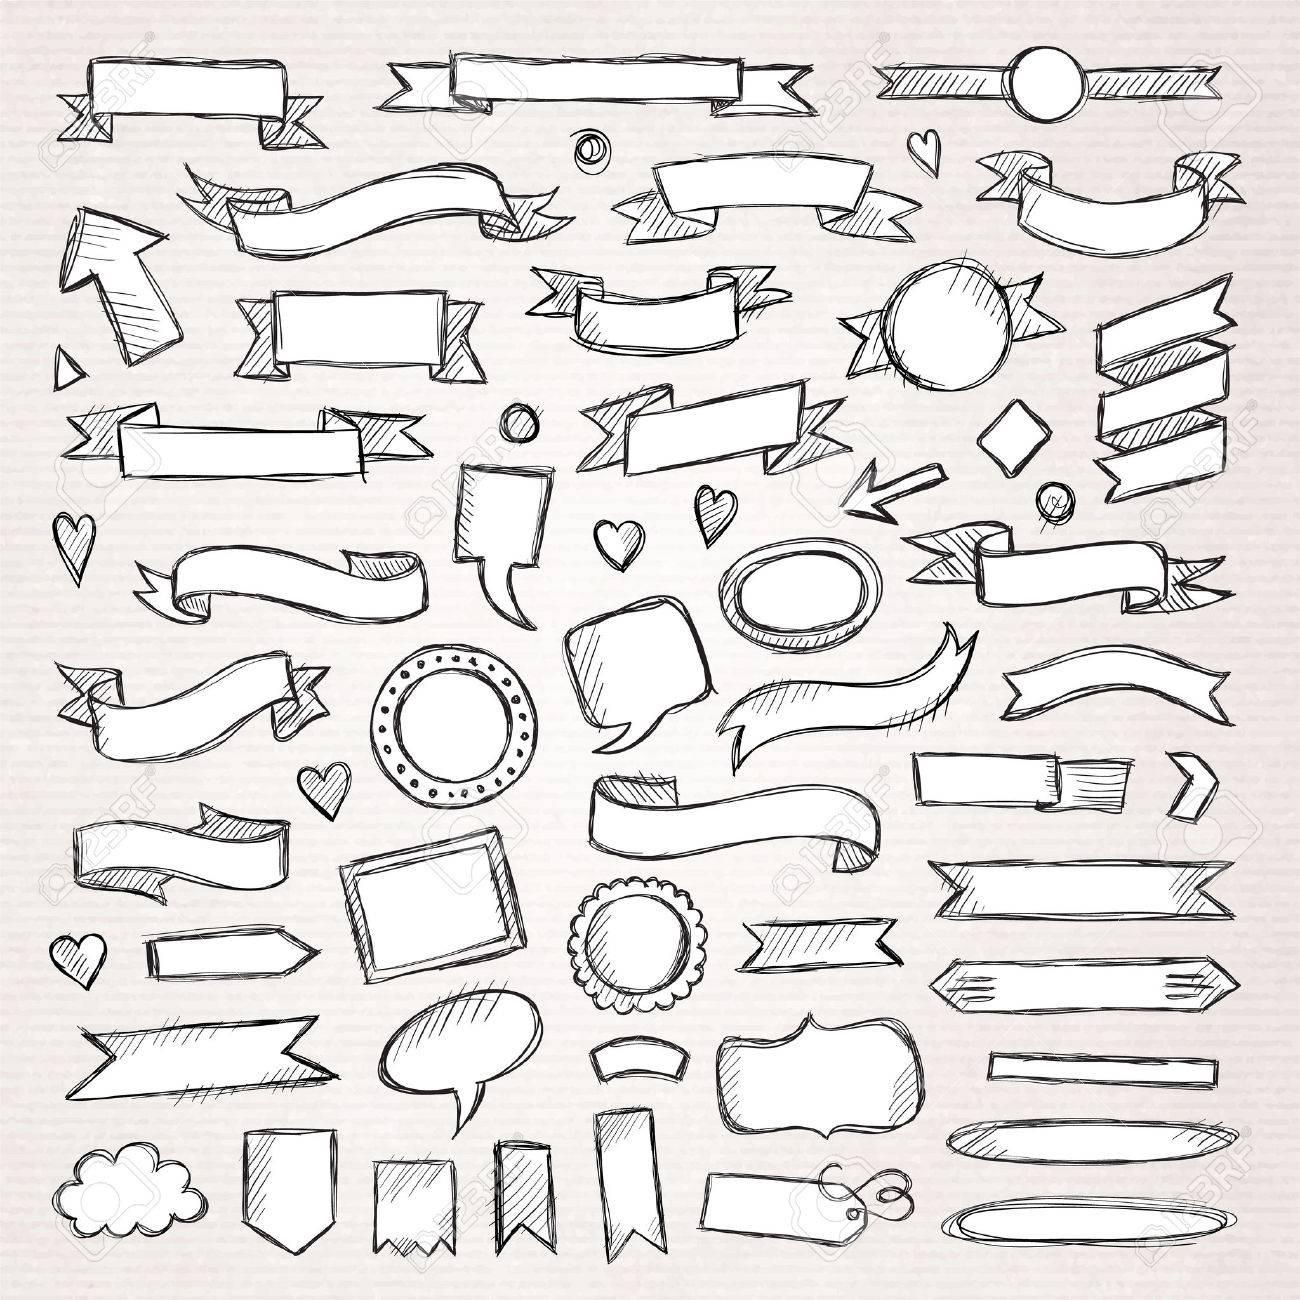 Hand drawn sketch hand drawn elements. Vector illustration. - 40213724